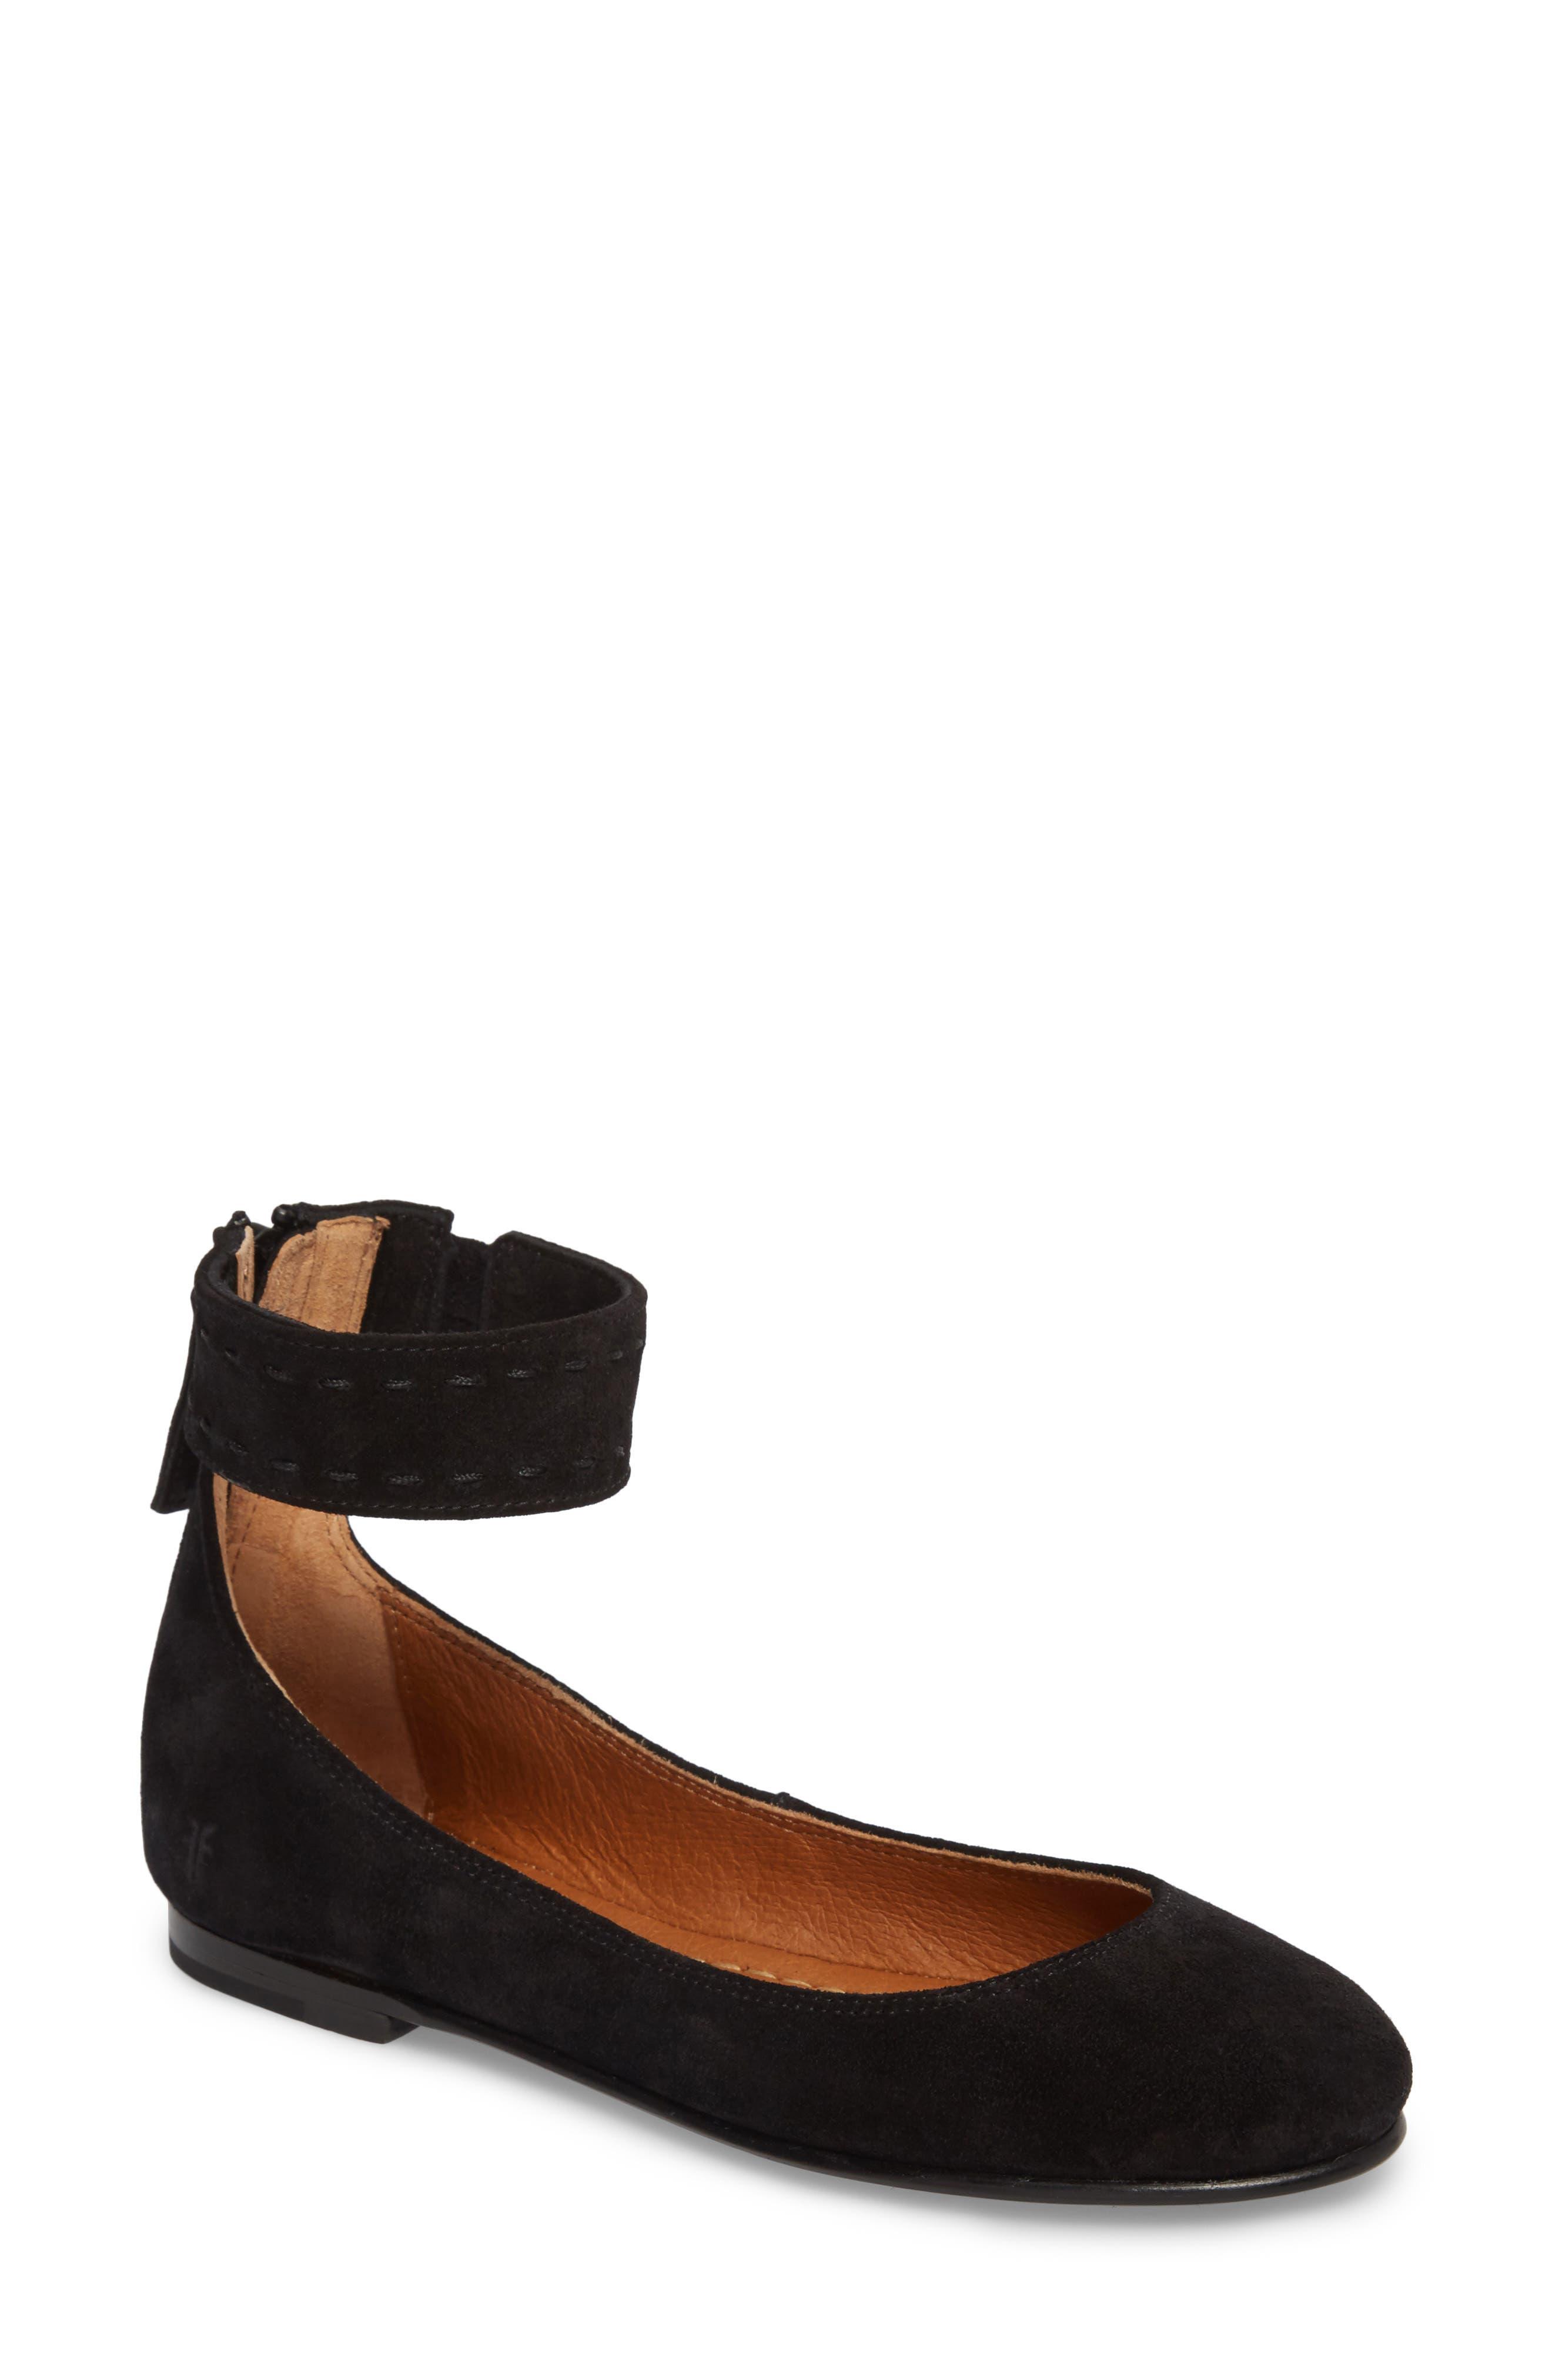 Carson Ankle Strap Ballet Flat,                         Main,                         color, 001